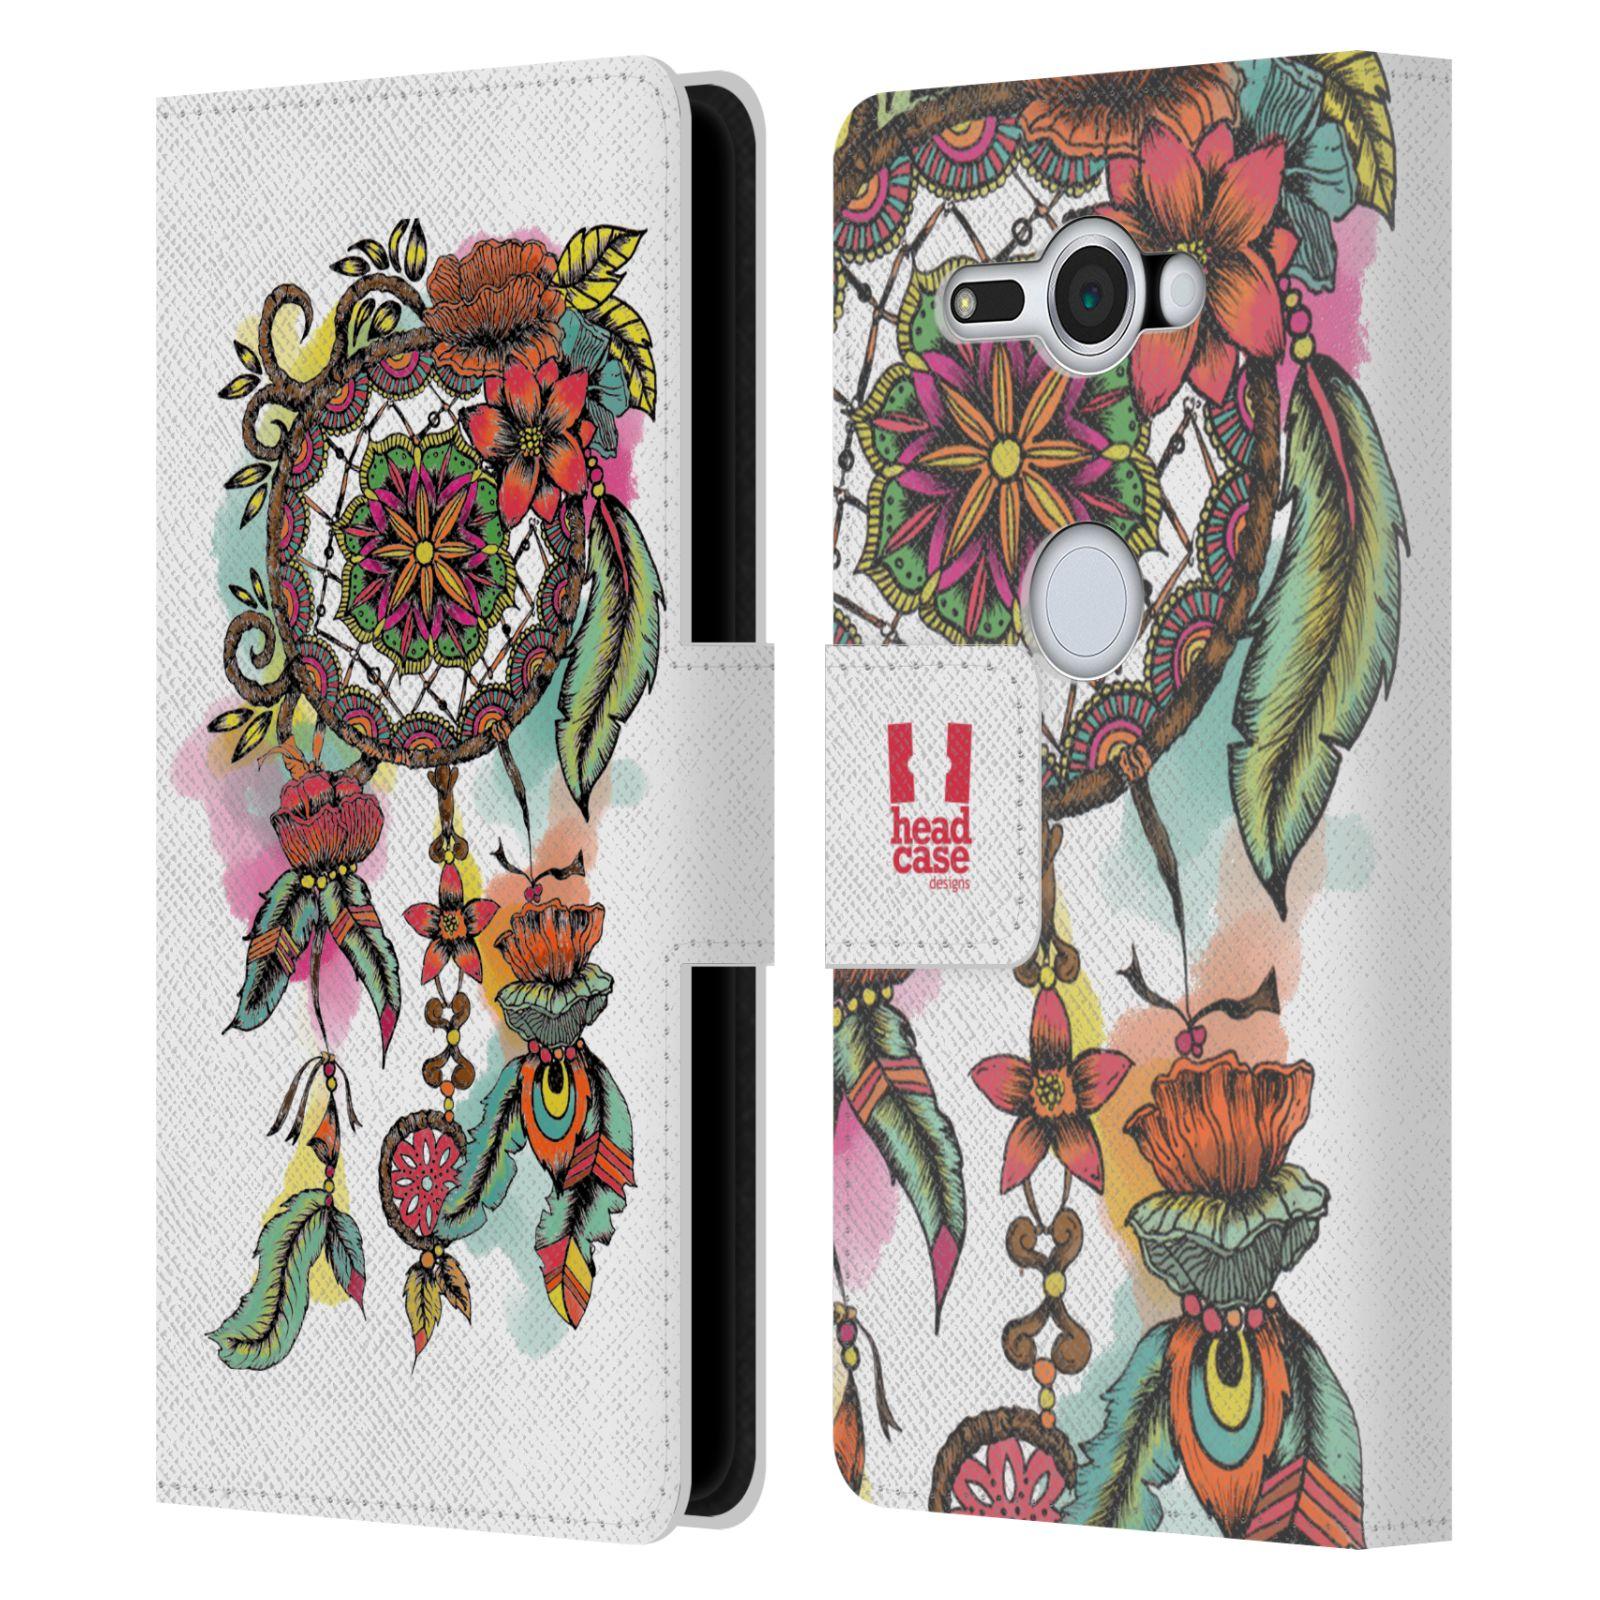 Pouzdro na mobil Sony Xperia XZ2 Compact - Head Case - Lapač snů květy červená